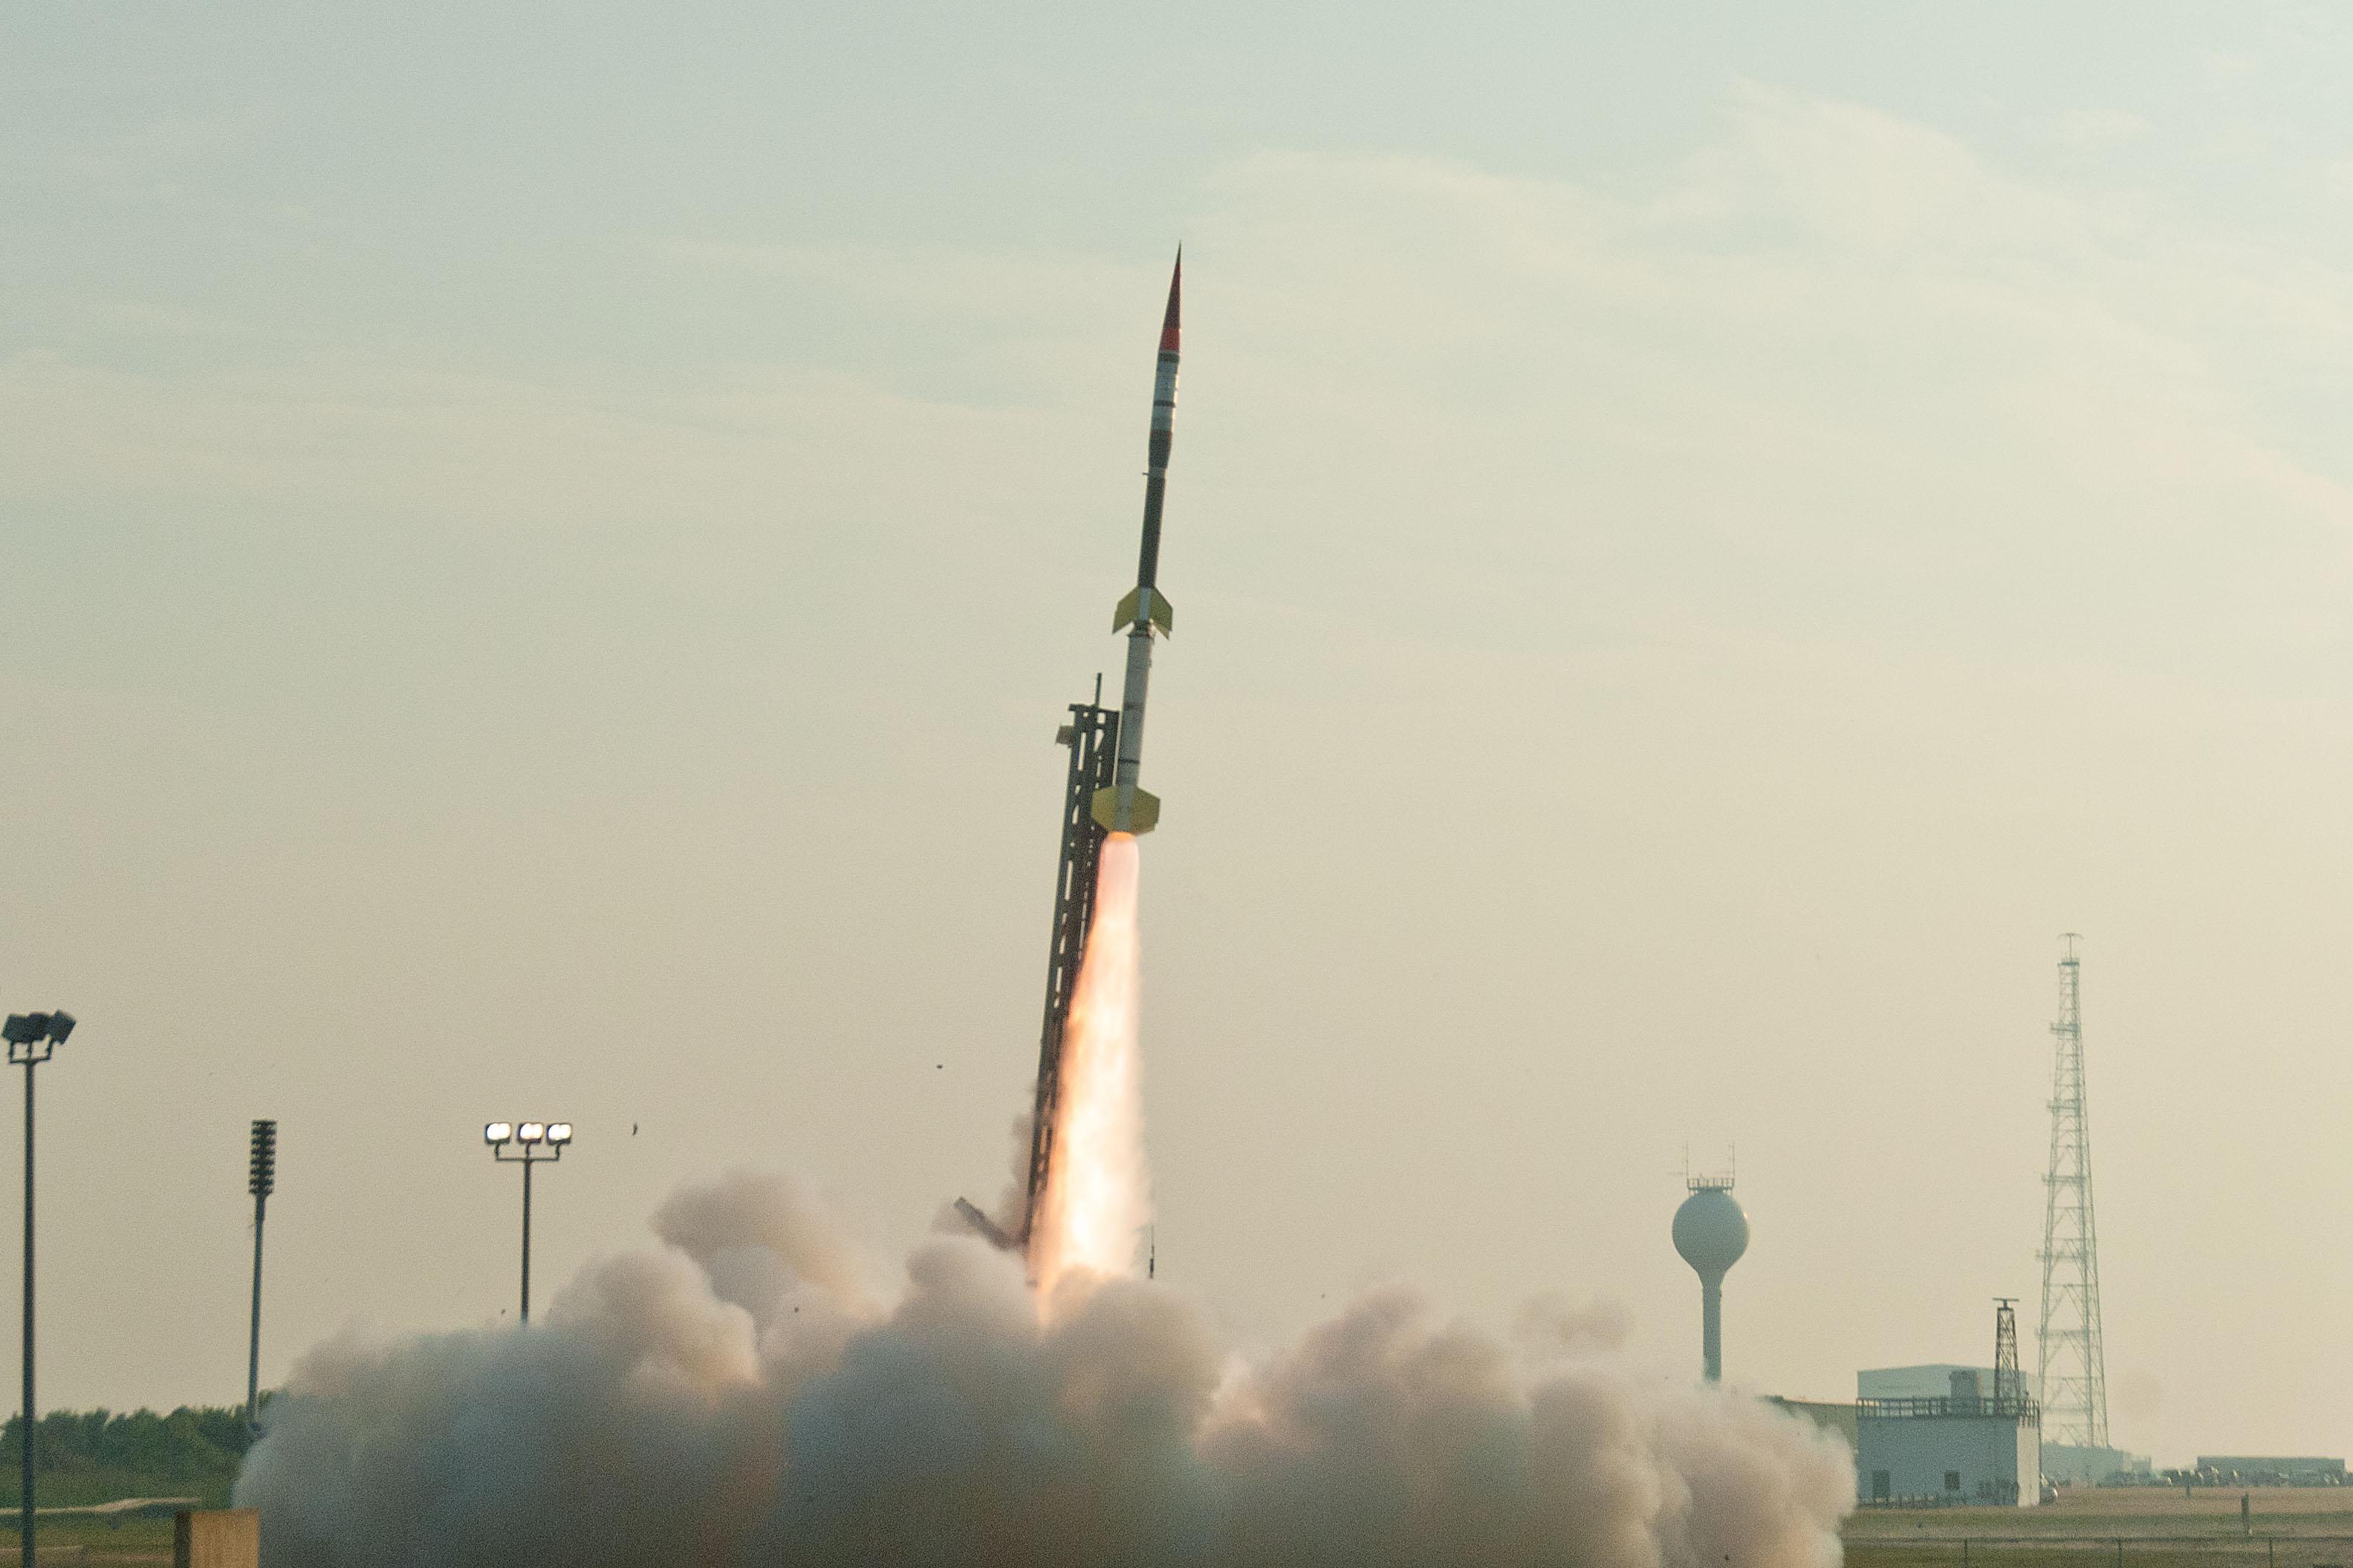 nasa wallops rocket launch - photo #24